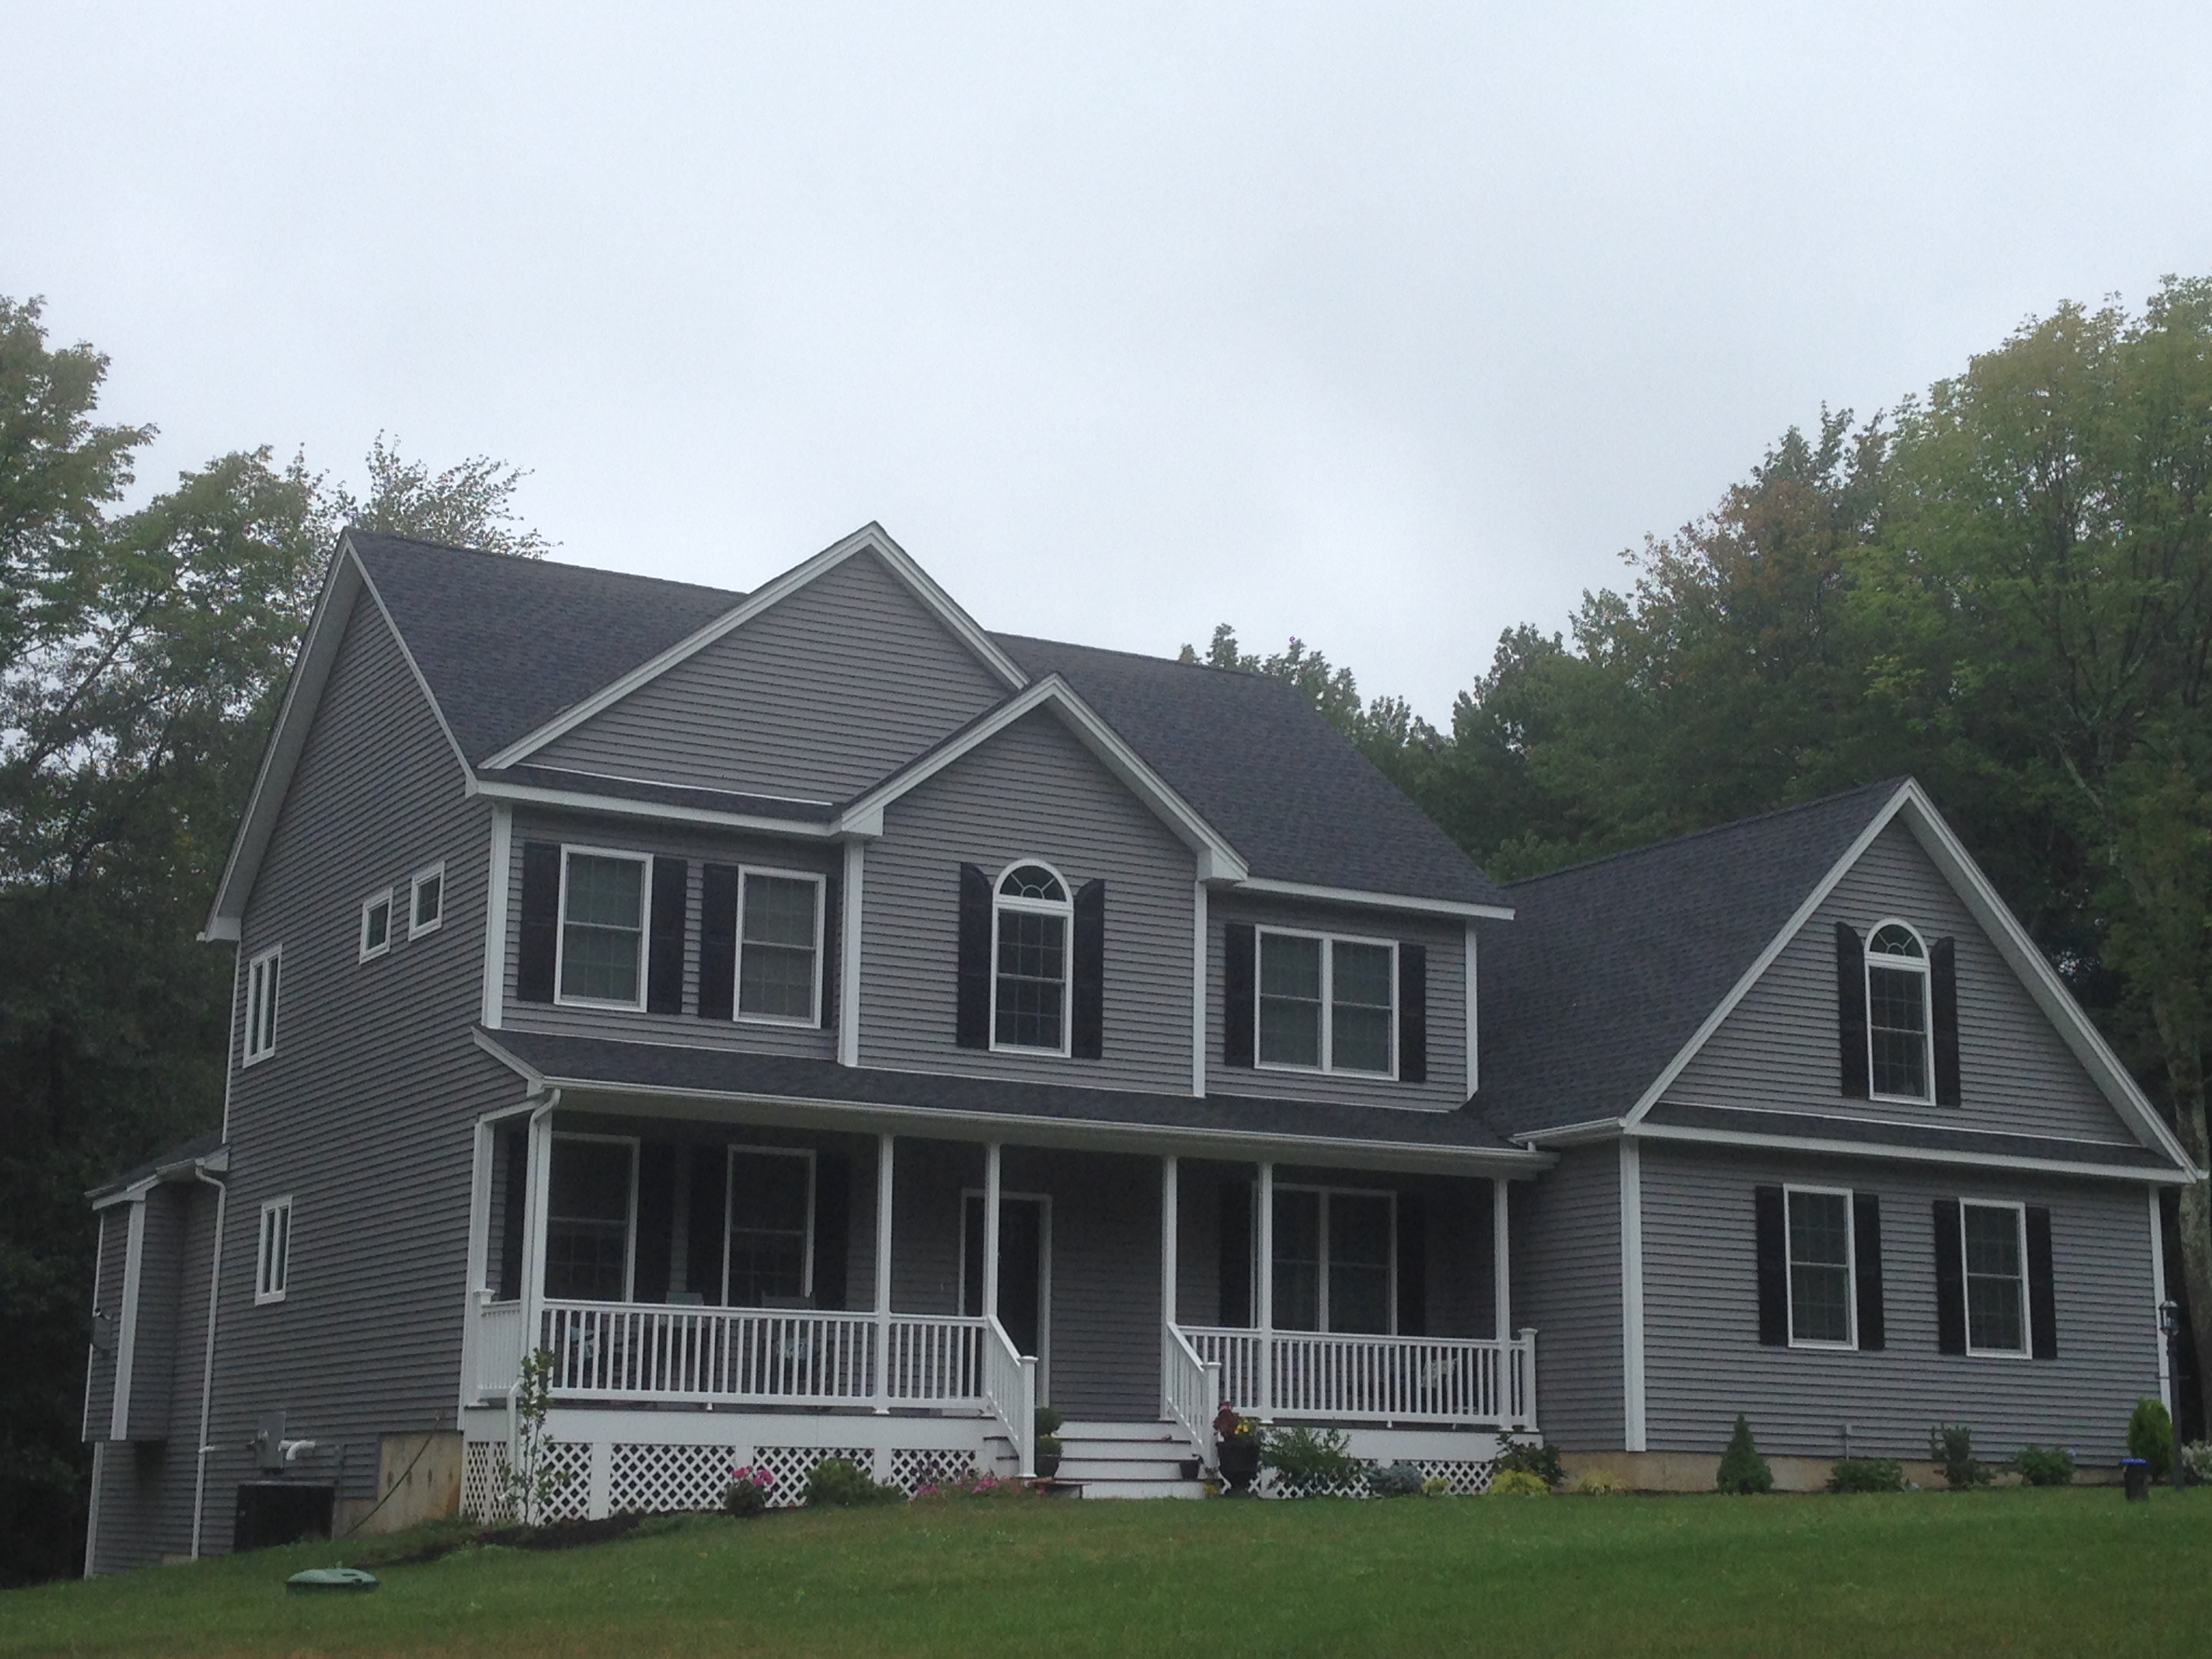 Dark Gray Sided Home